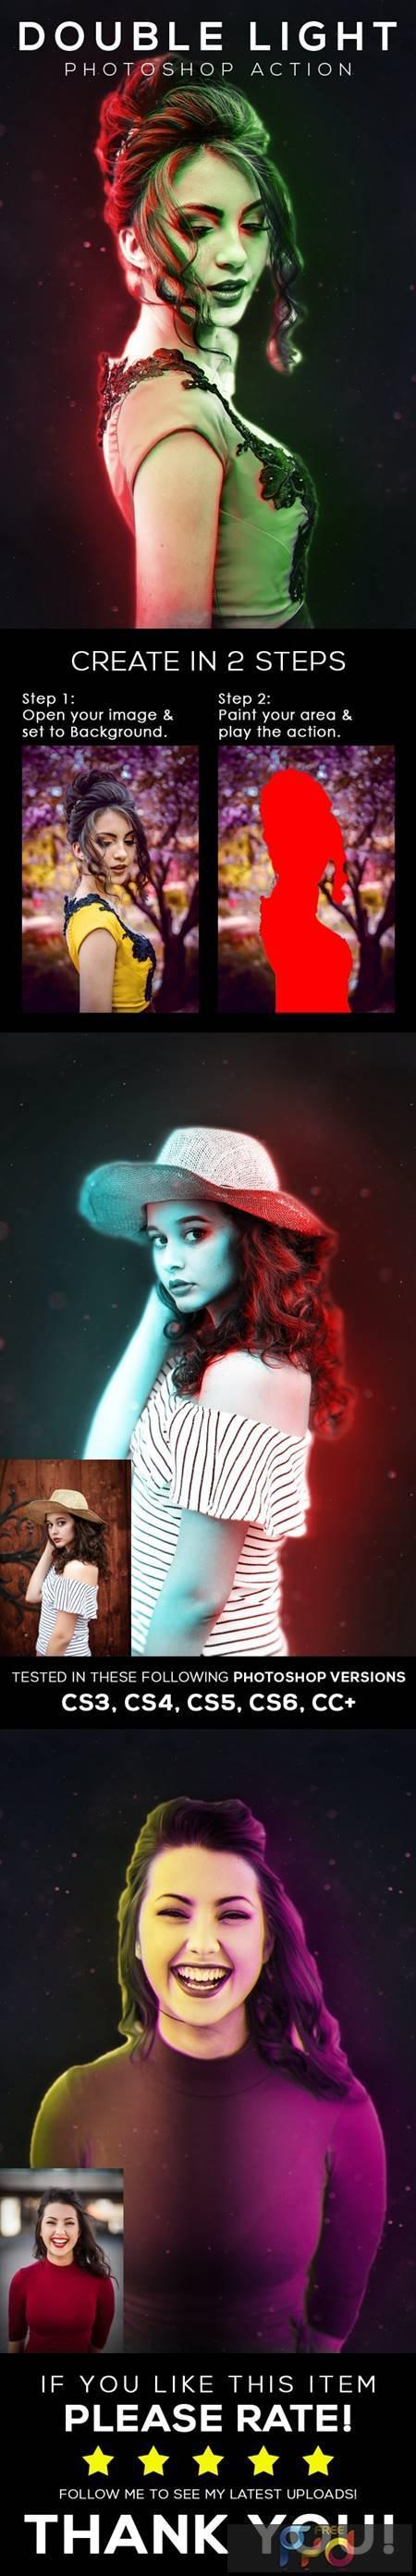 Double Light Photoshop Action 26459912 1